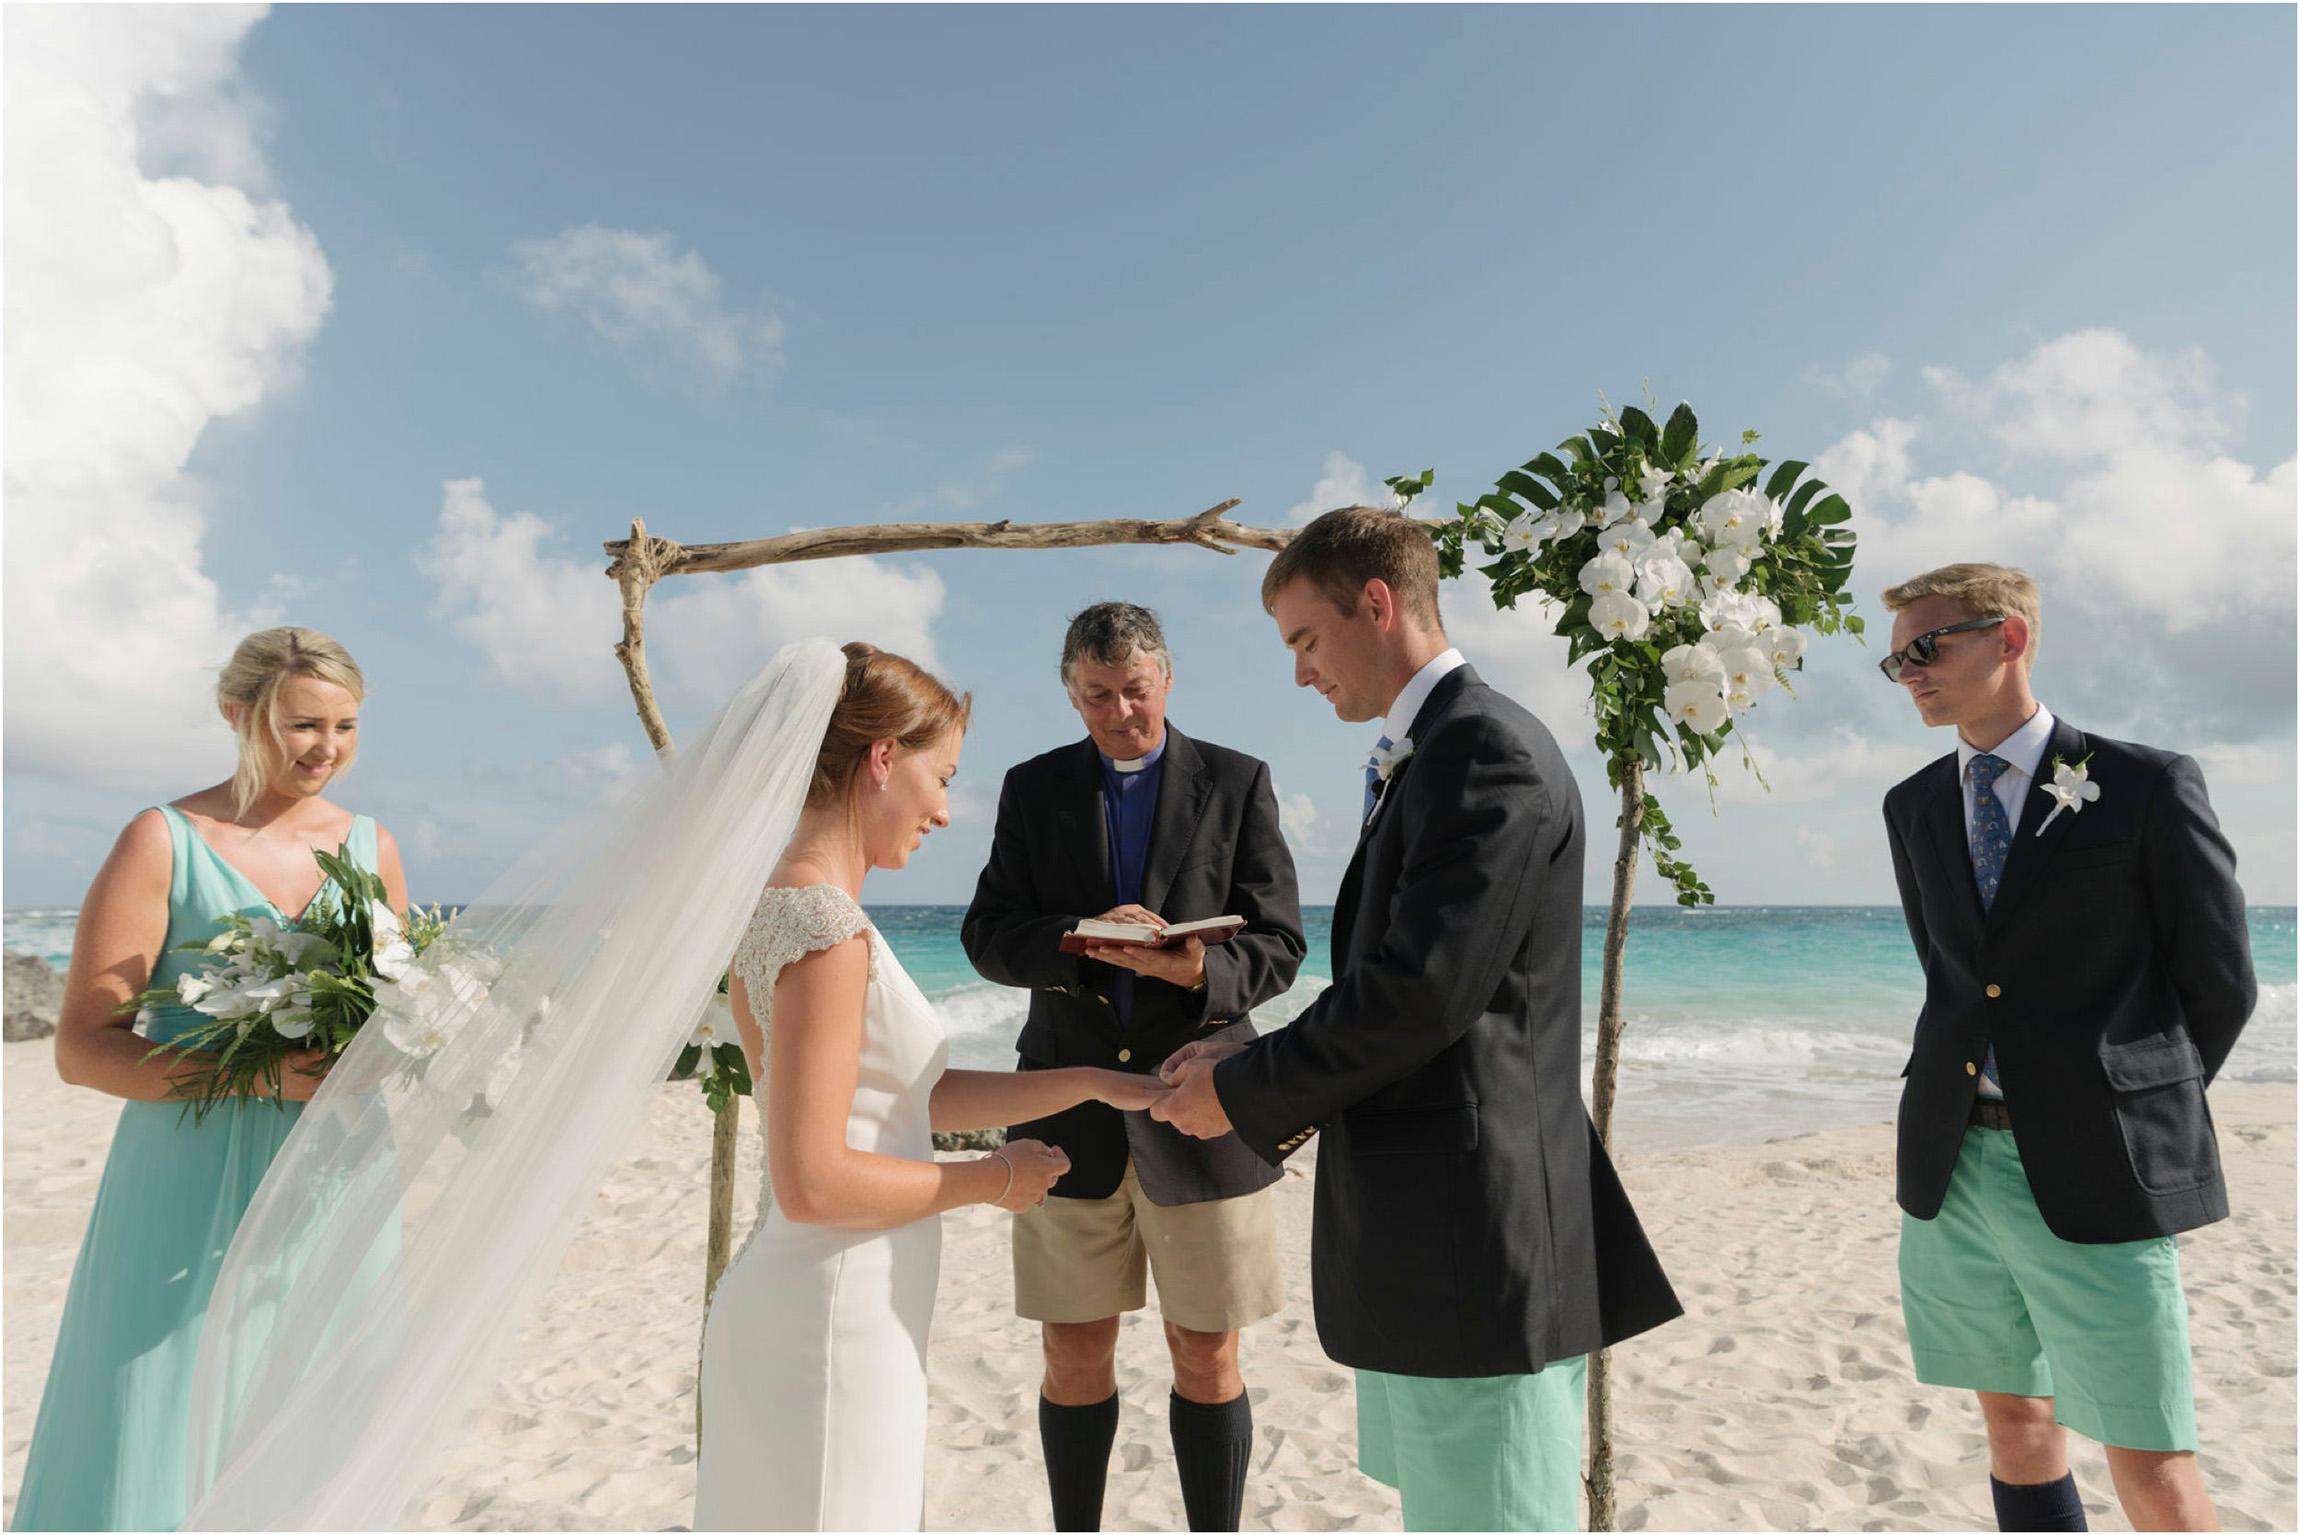 ©FianderFoto_Bermuda Wedding Photographer_Mid Ocean_Rachel_Angus_036.jpg